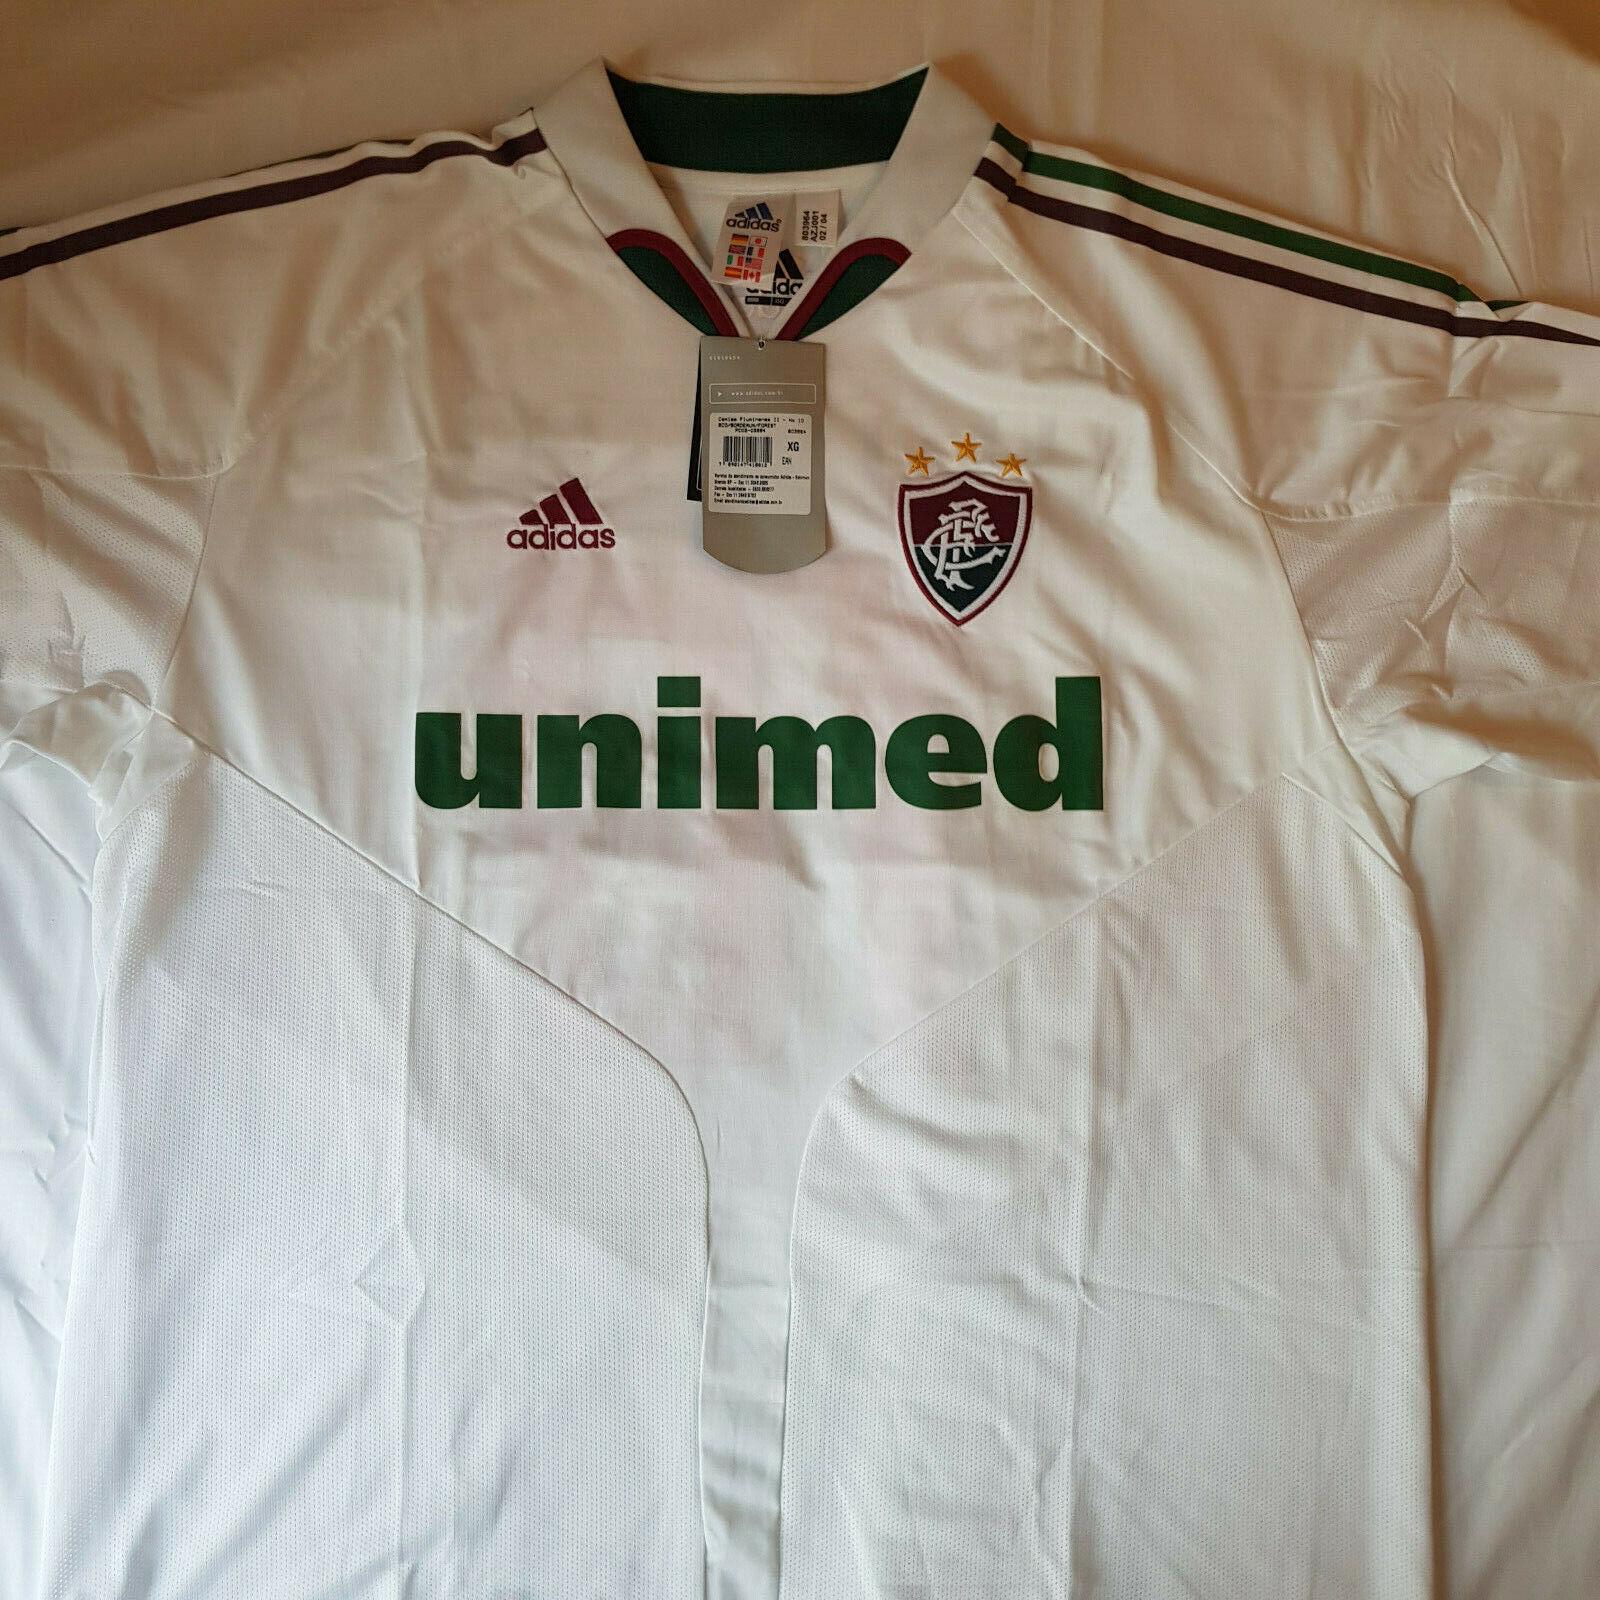 FLUMINENSE BRASILE AWAY FOOTBtutti SHIRT 2005 trikot maglia ADIDAS XL NUOVO CON ETICHETTA no.10